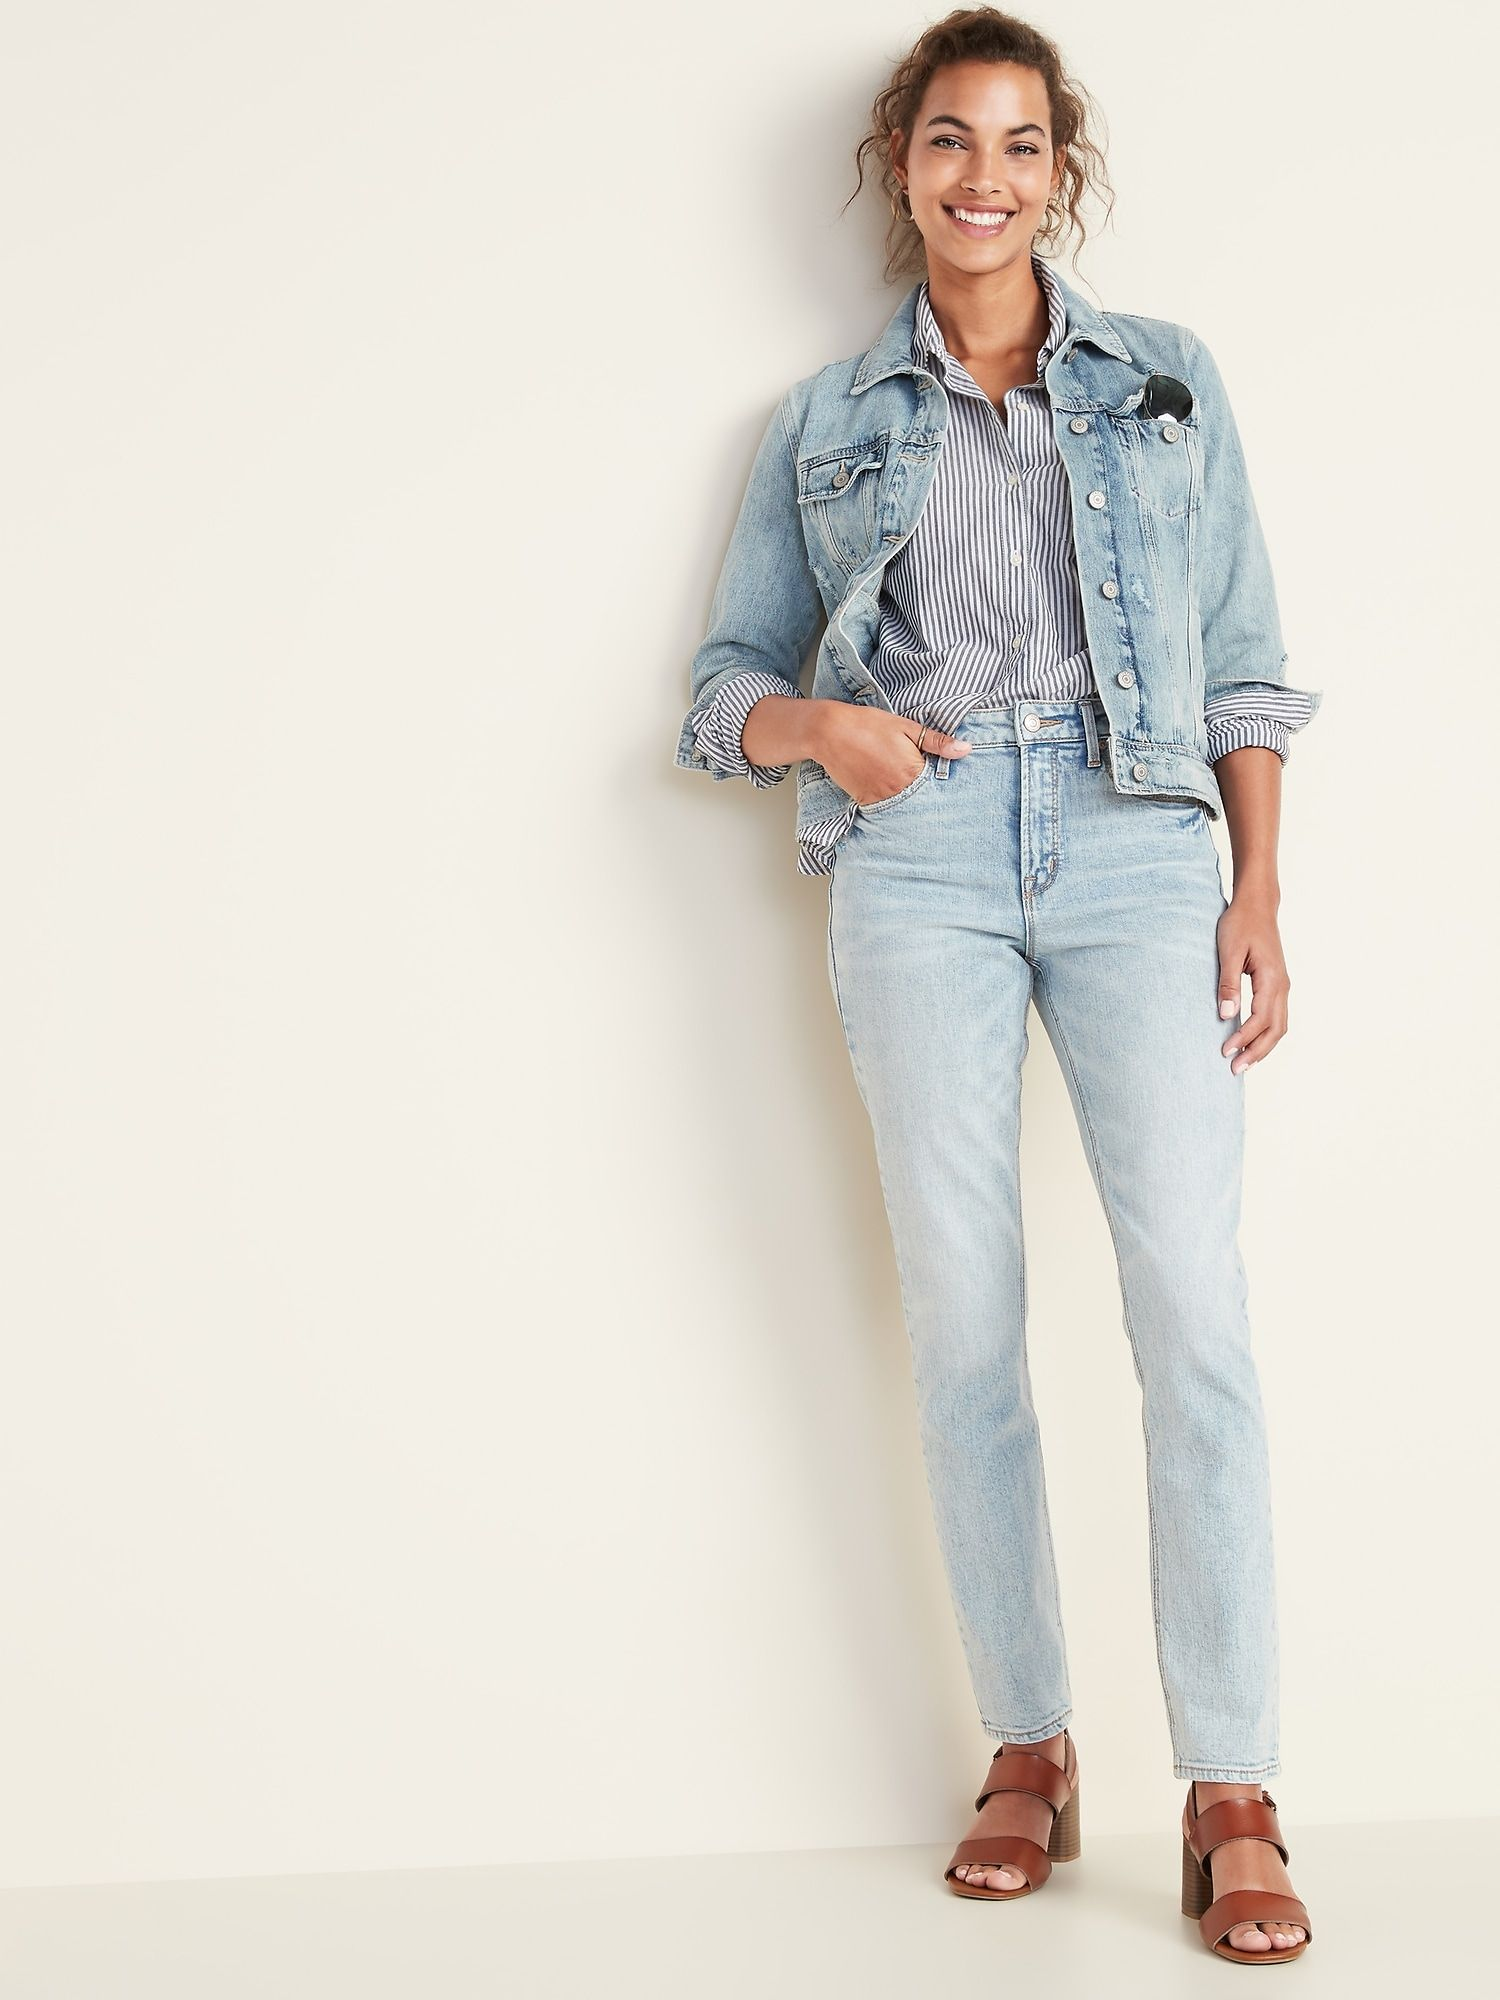 25++ Old navy womens jeans ideas ideas in 2021